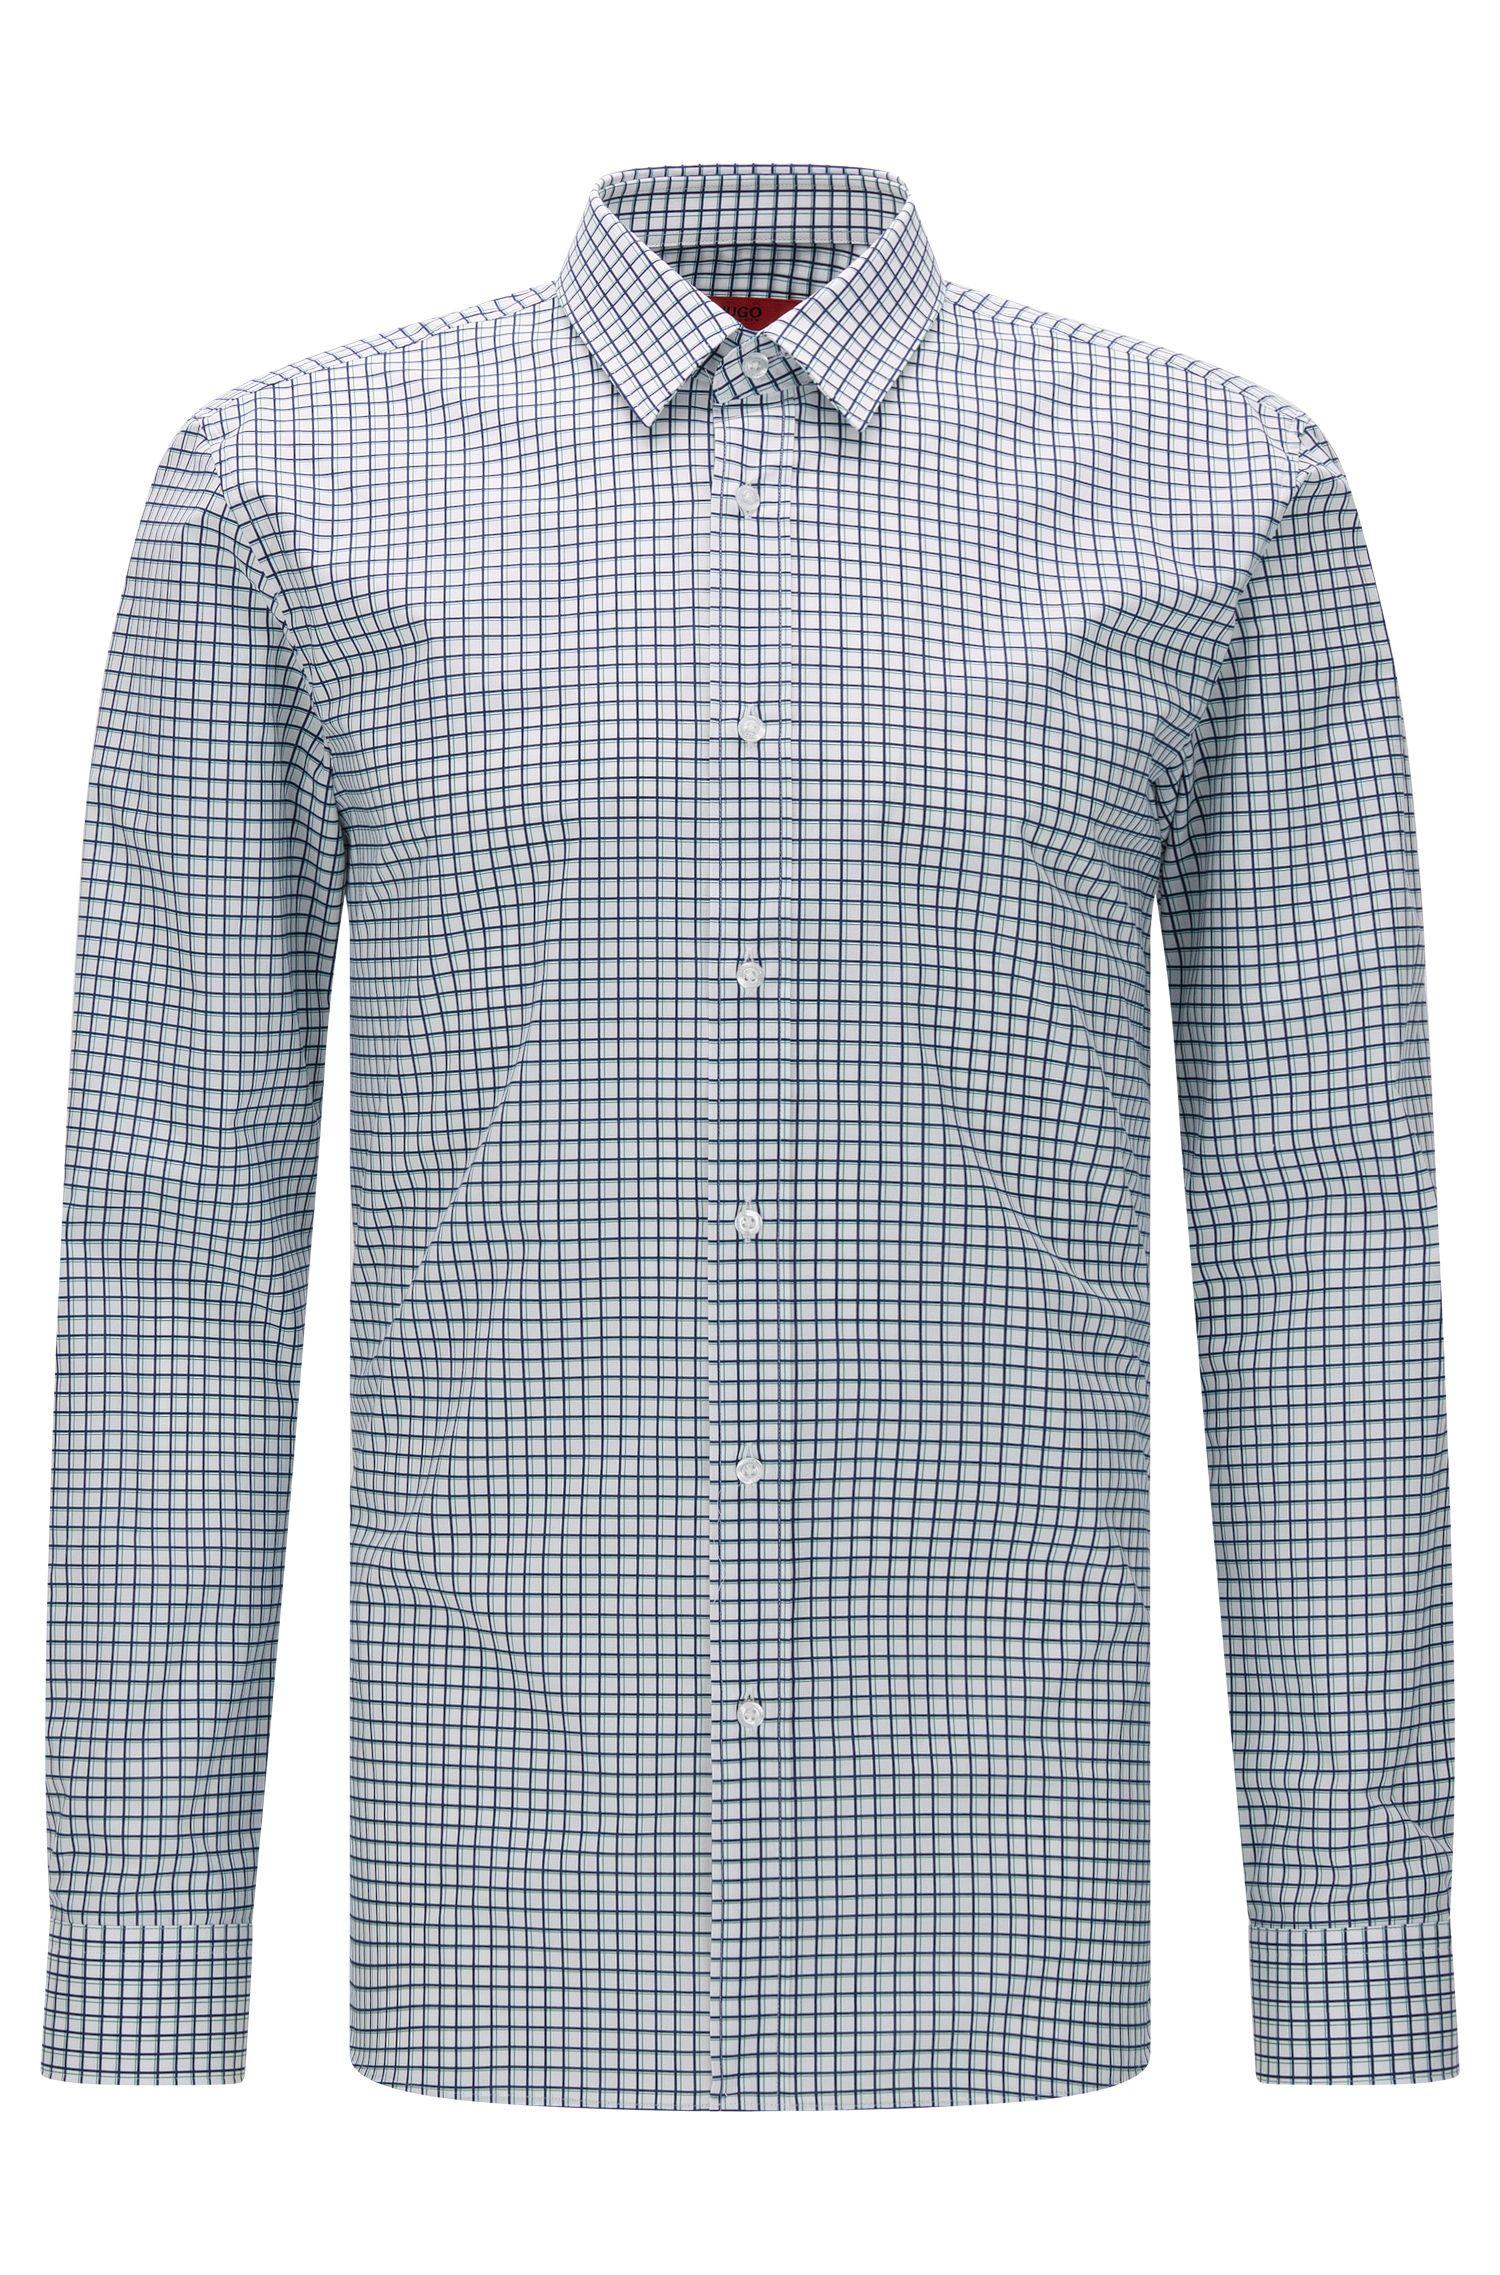 'Elisha' | Exra Slim Fit, Cotton Button Down Shirt